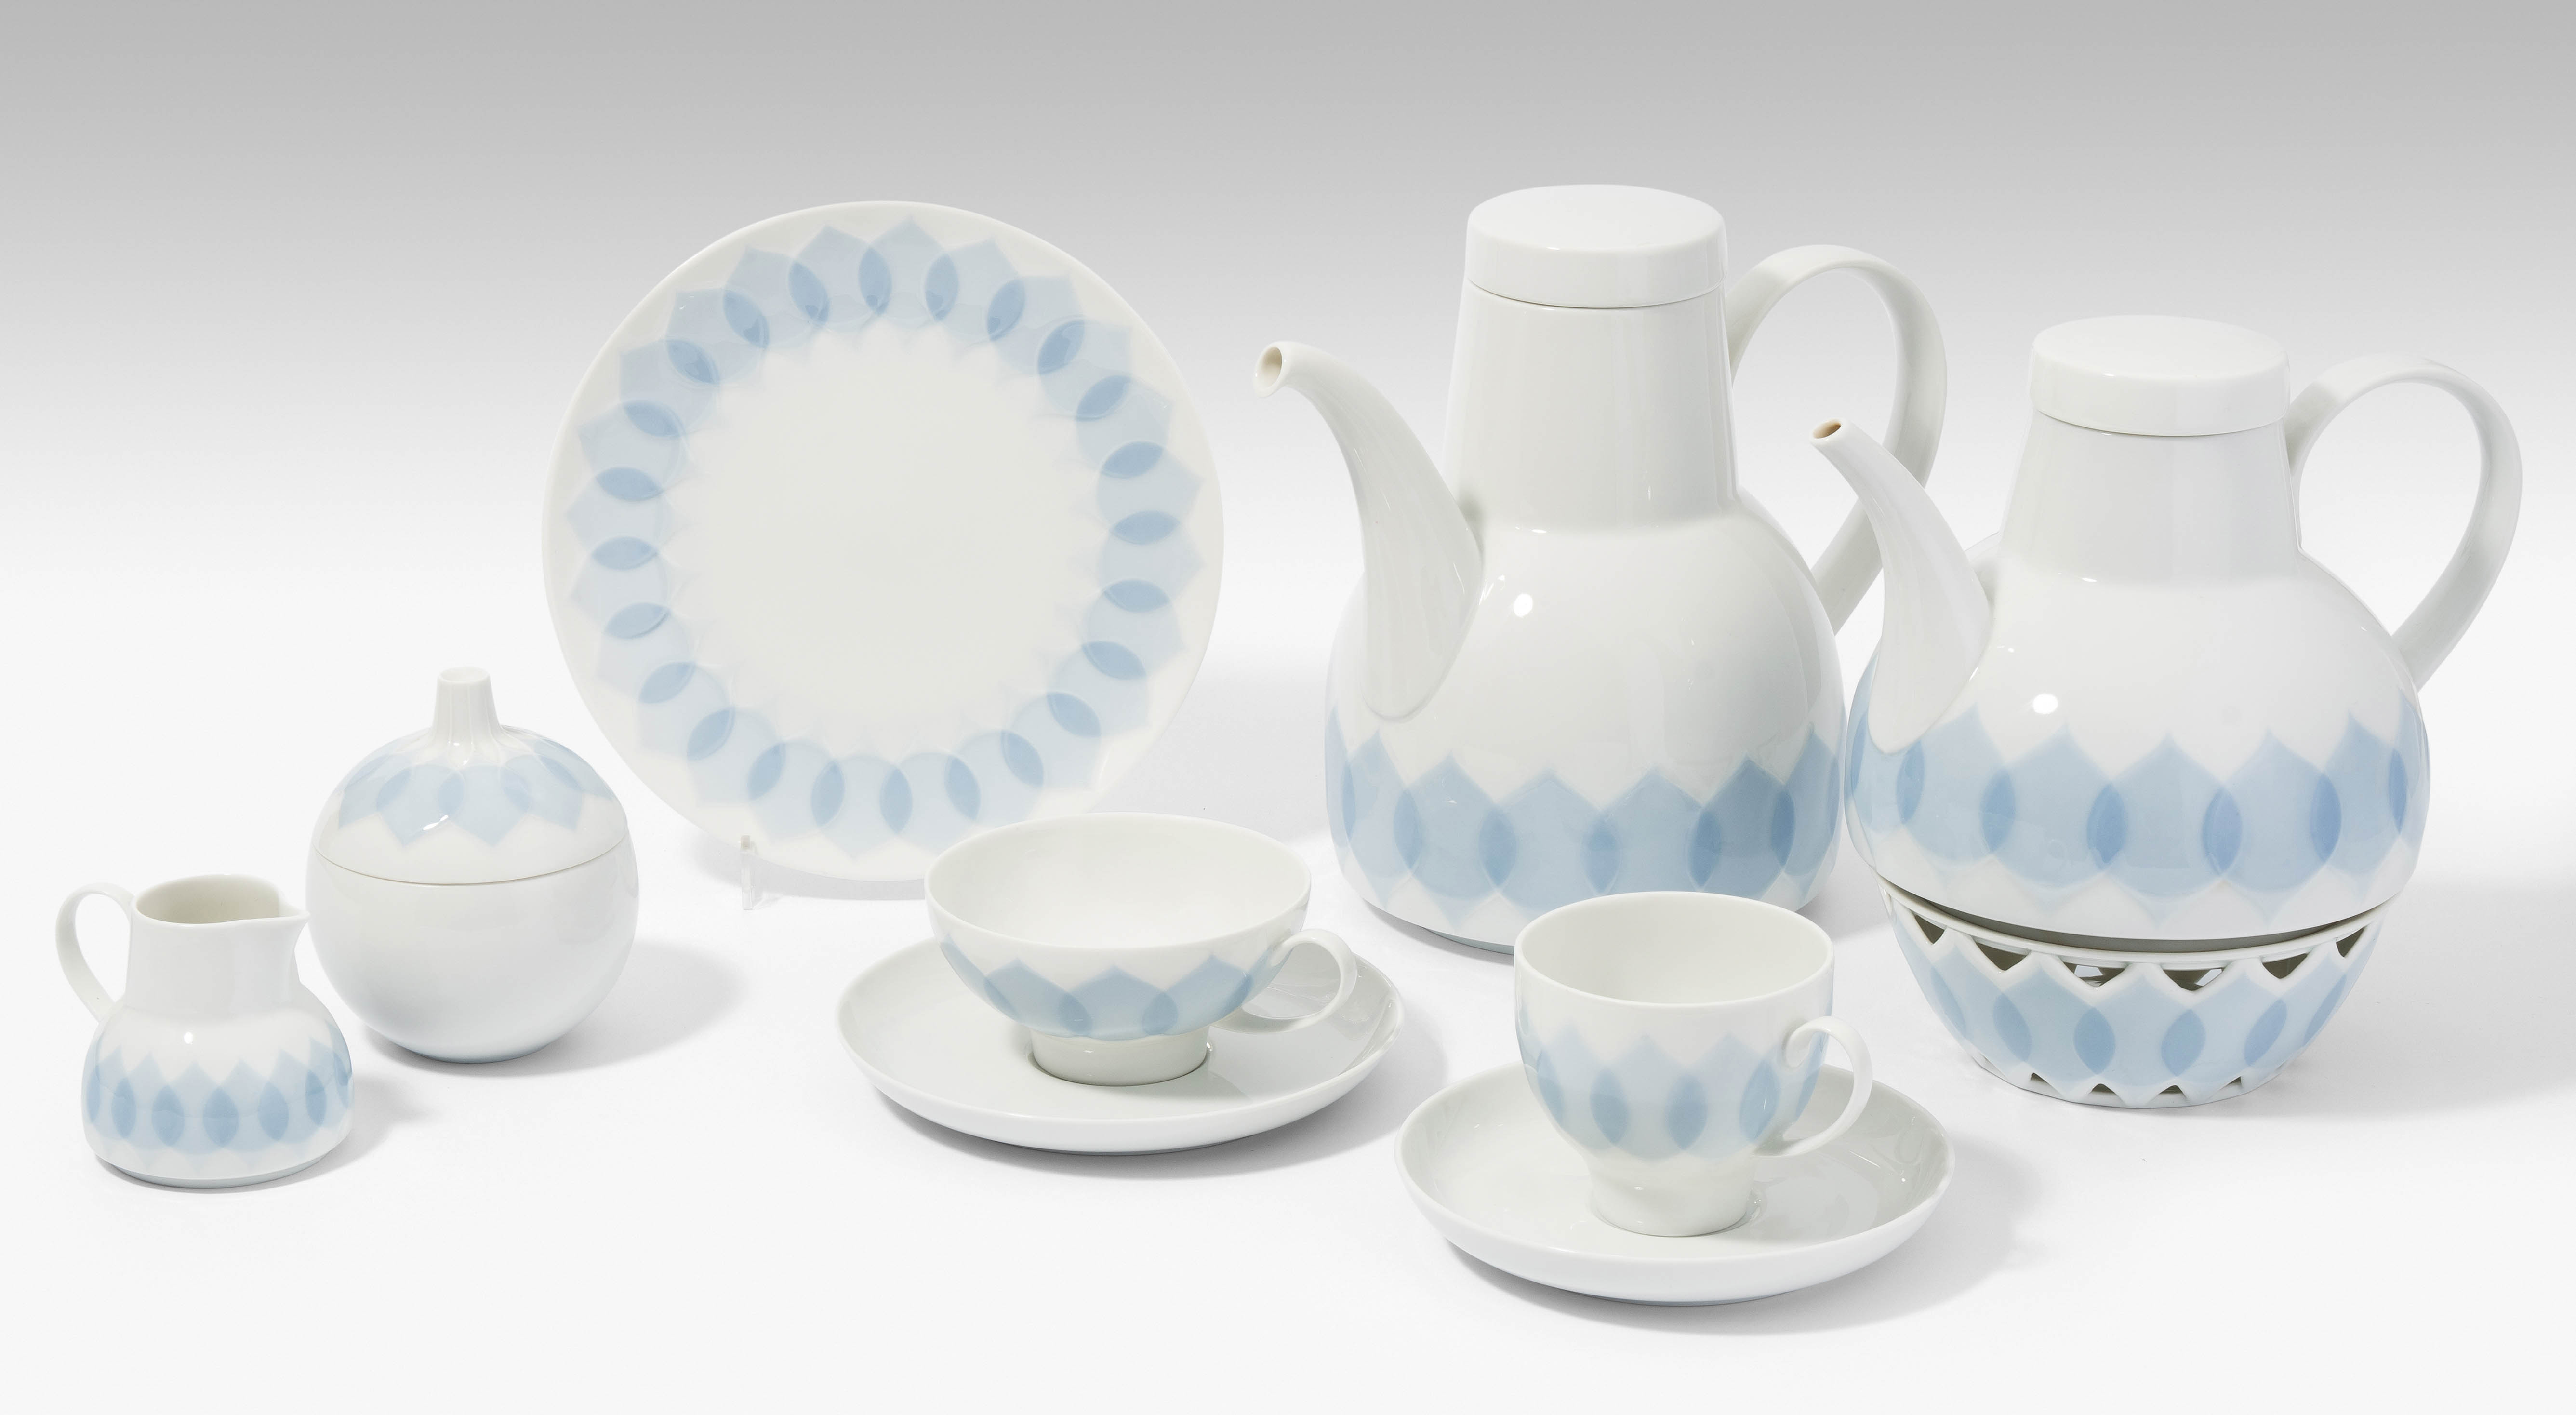 Rosenthal, Kaffe/Teeservice